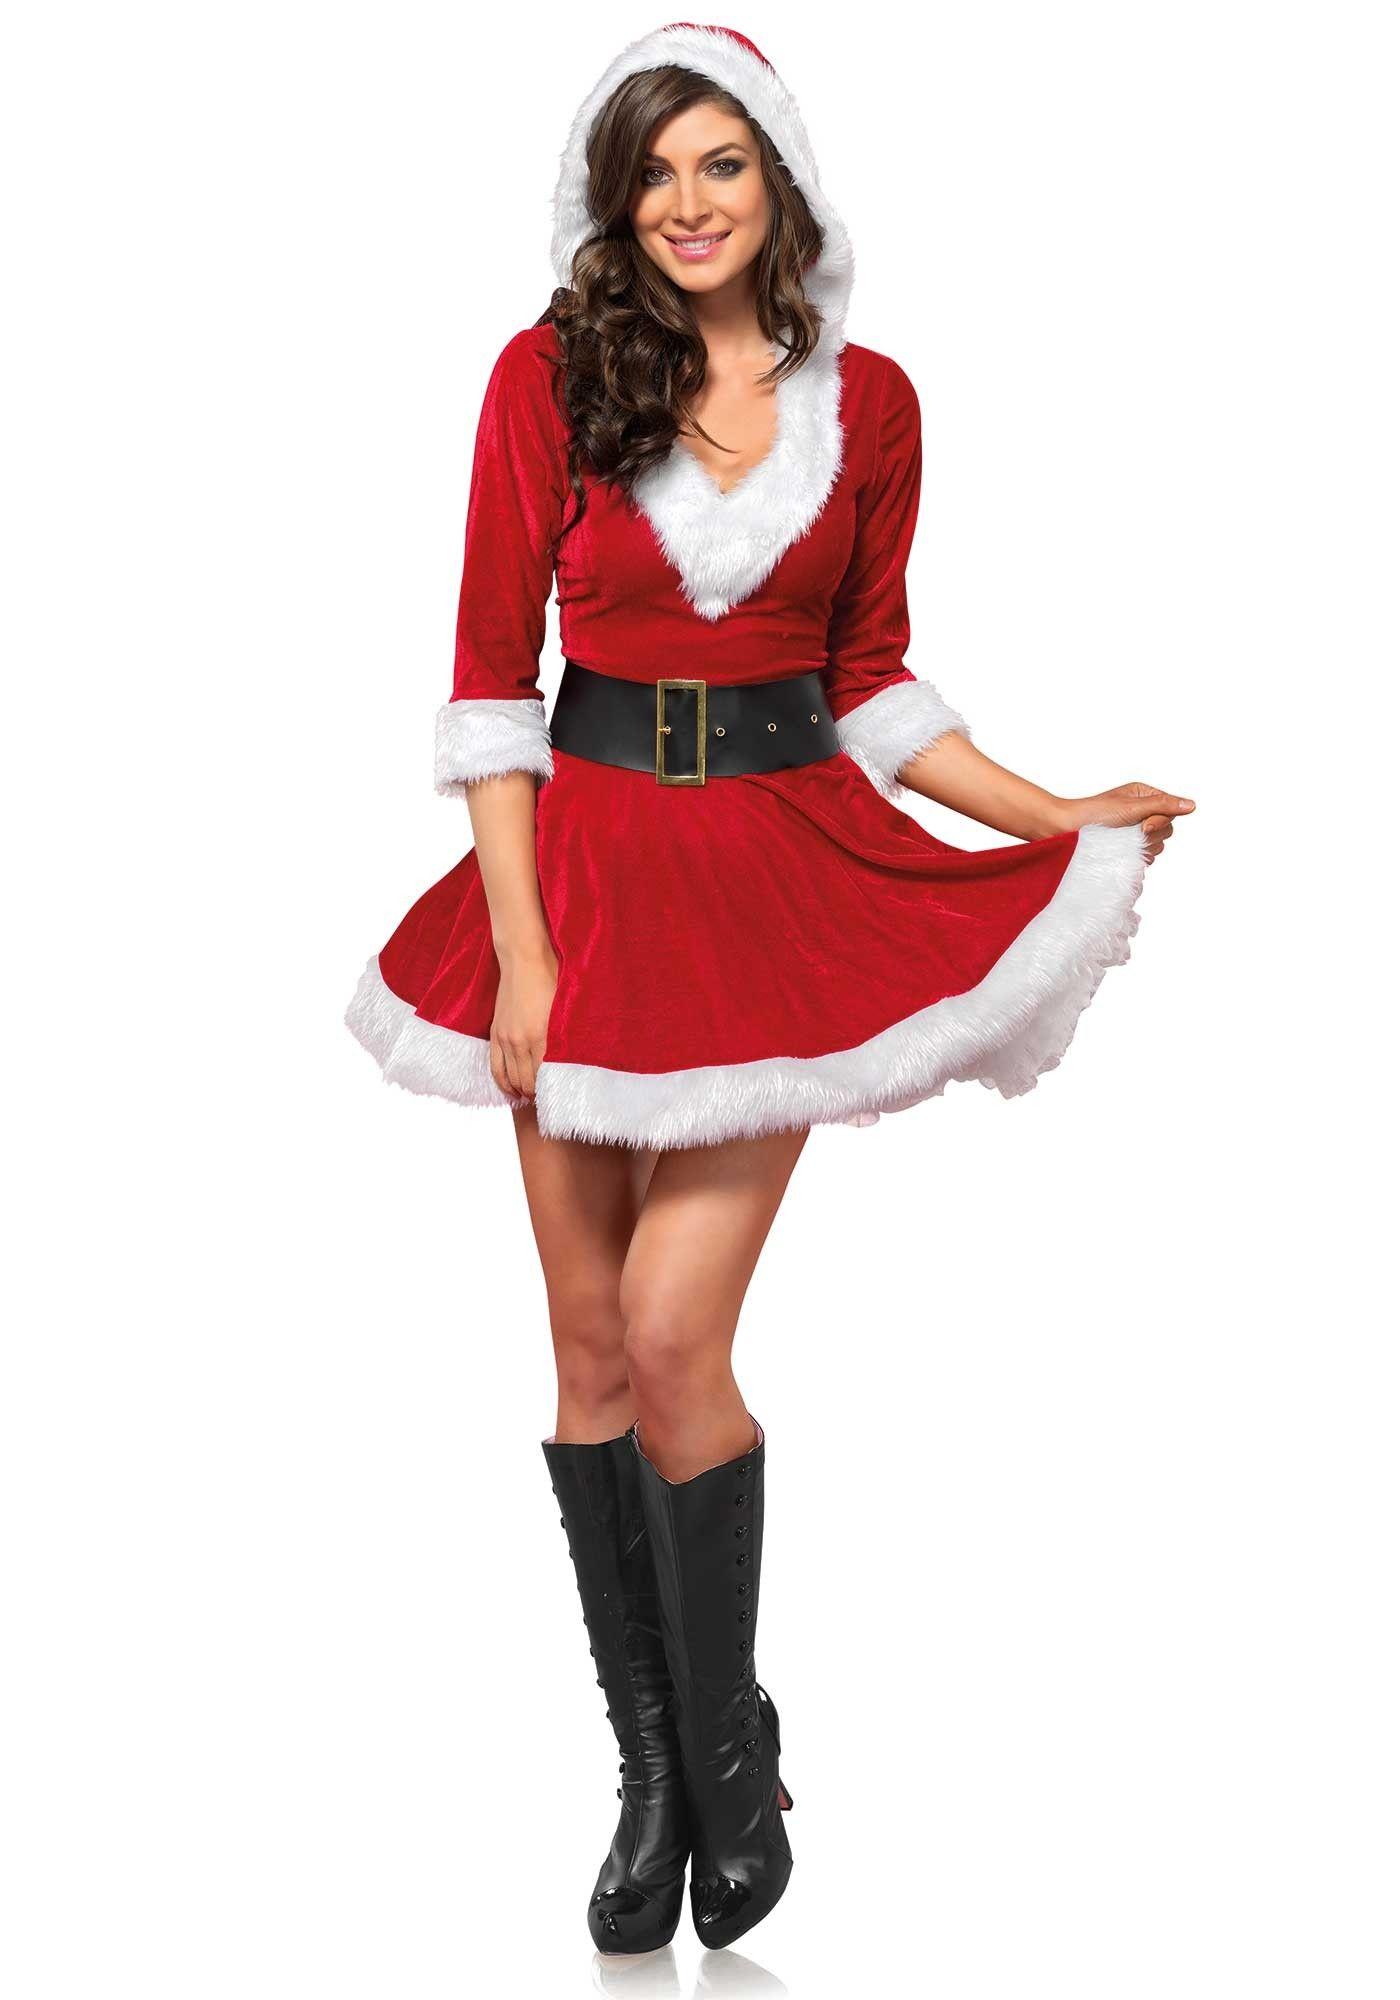 B˜ARD Santa Baby by Rissyjanee ѕanтa вaвy Pinterest